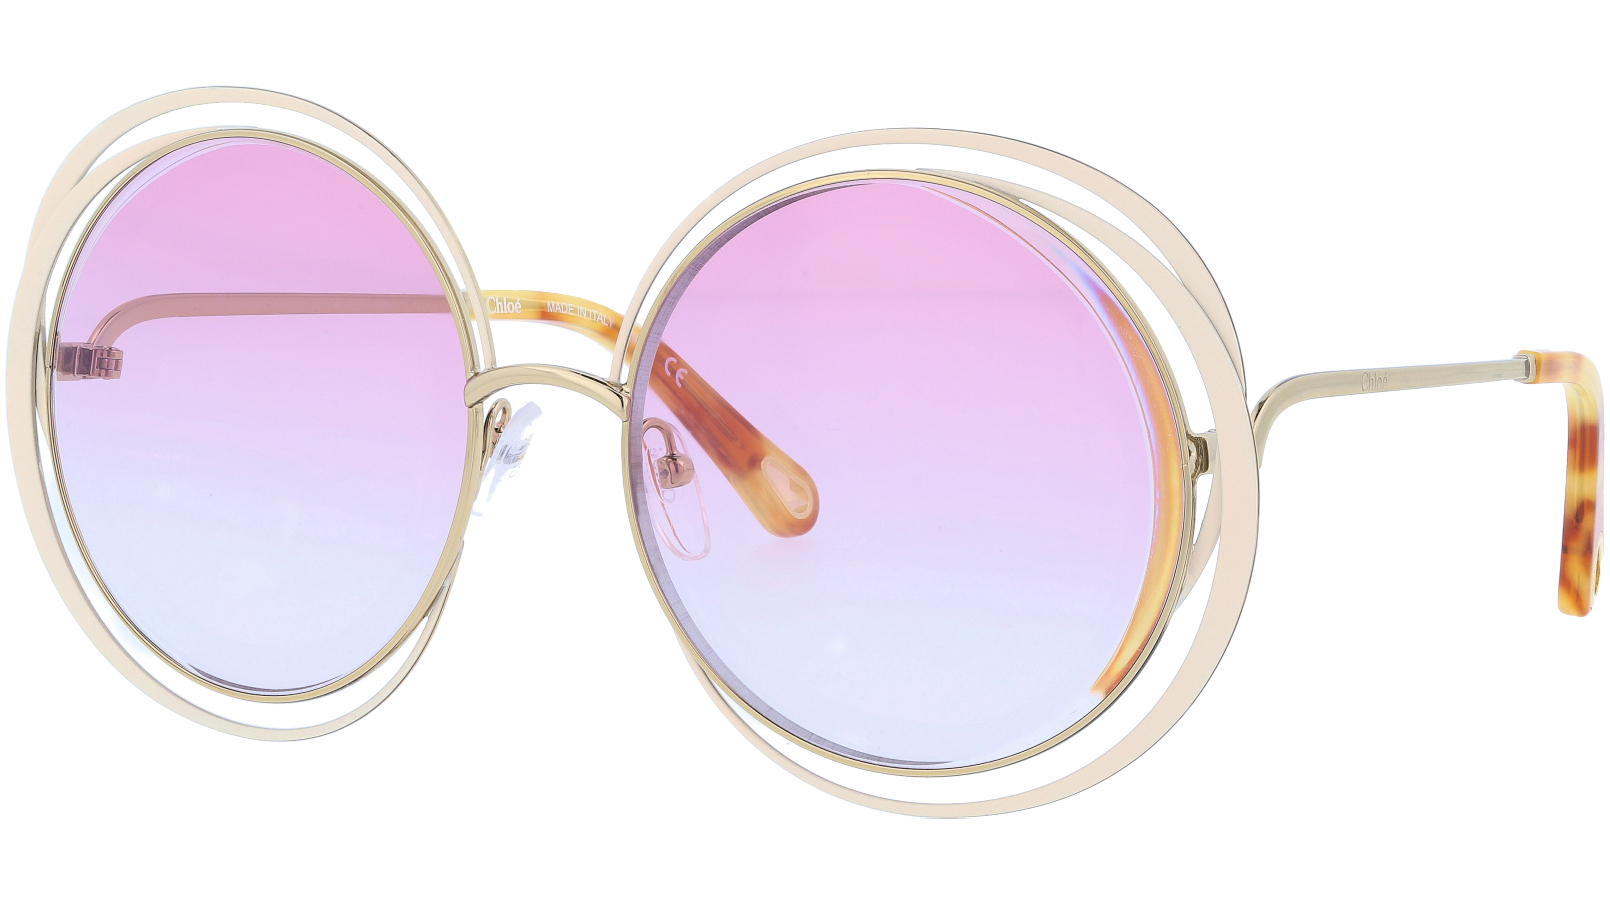 CHLOE CE155S 743 59 Gold Brown Carlina Round Sunglasses